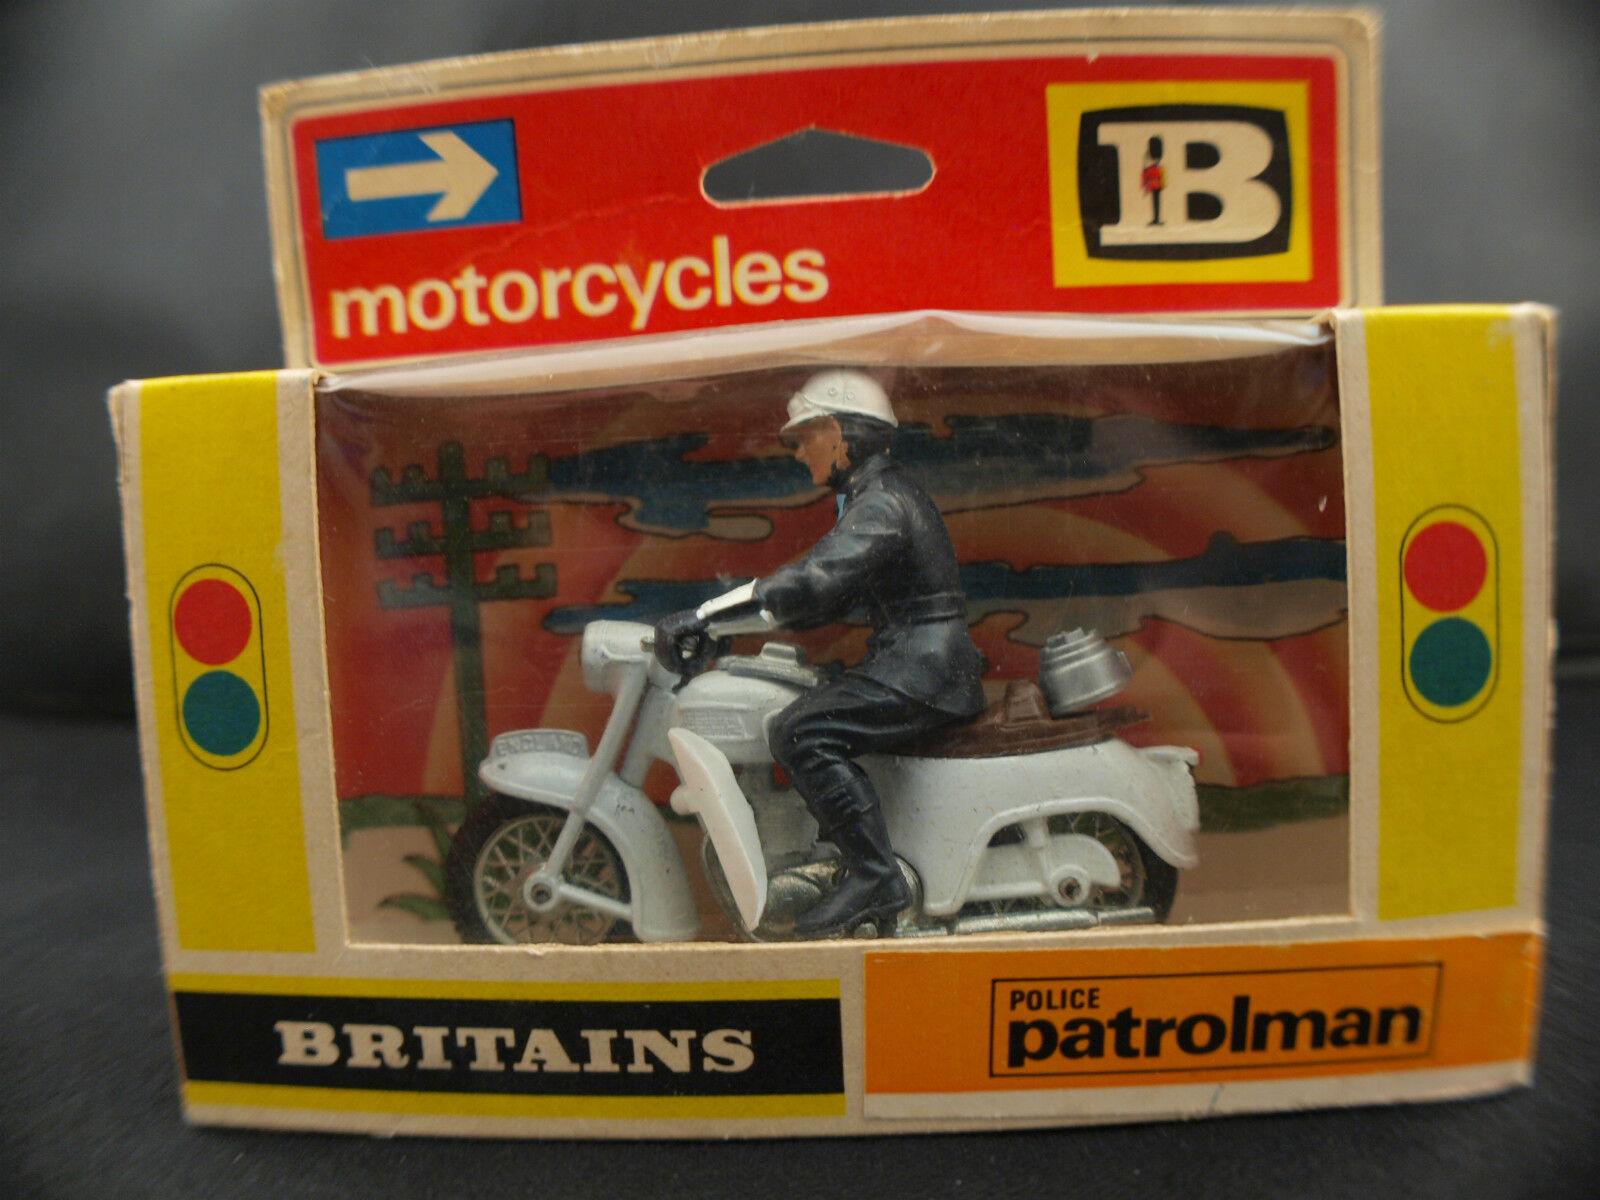 Britains  N° 9697 Police patrolman motocyclette 1 32 jamais joué boite boxed MIB